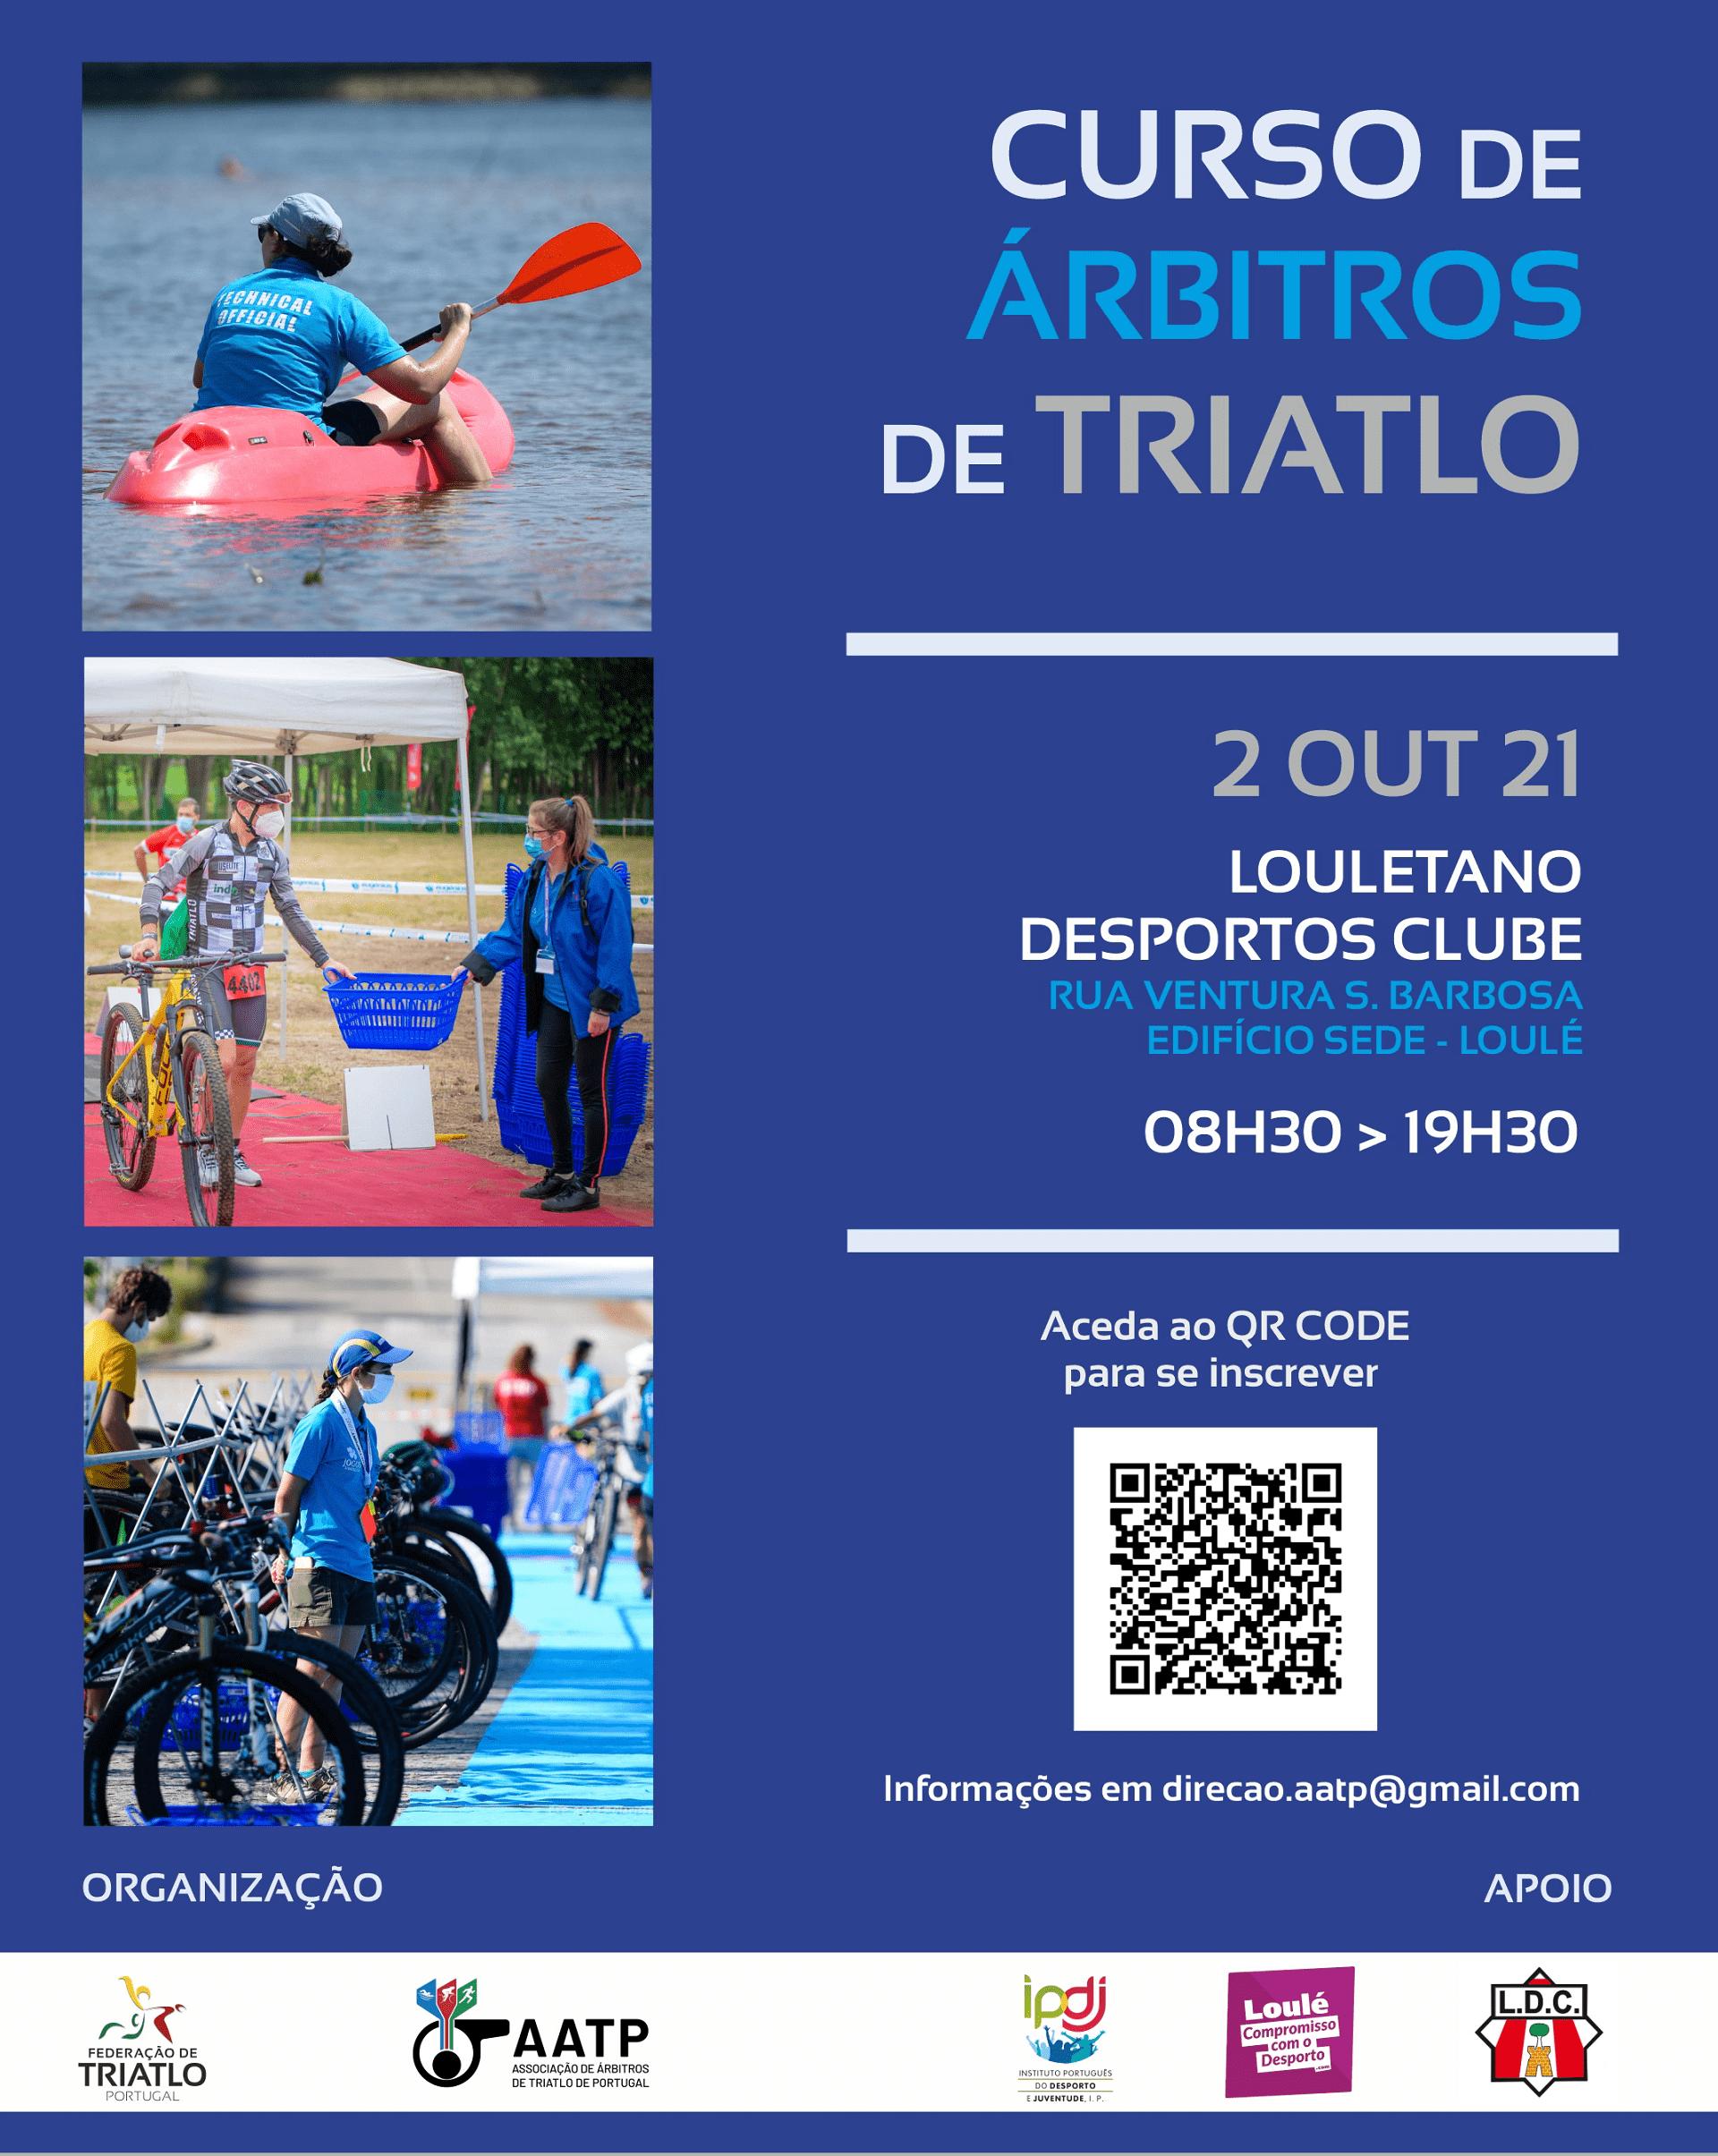 Curso Inicial de Árbitros de Triatlo, Loulé, 2 de outubro 2021